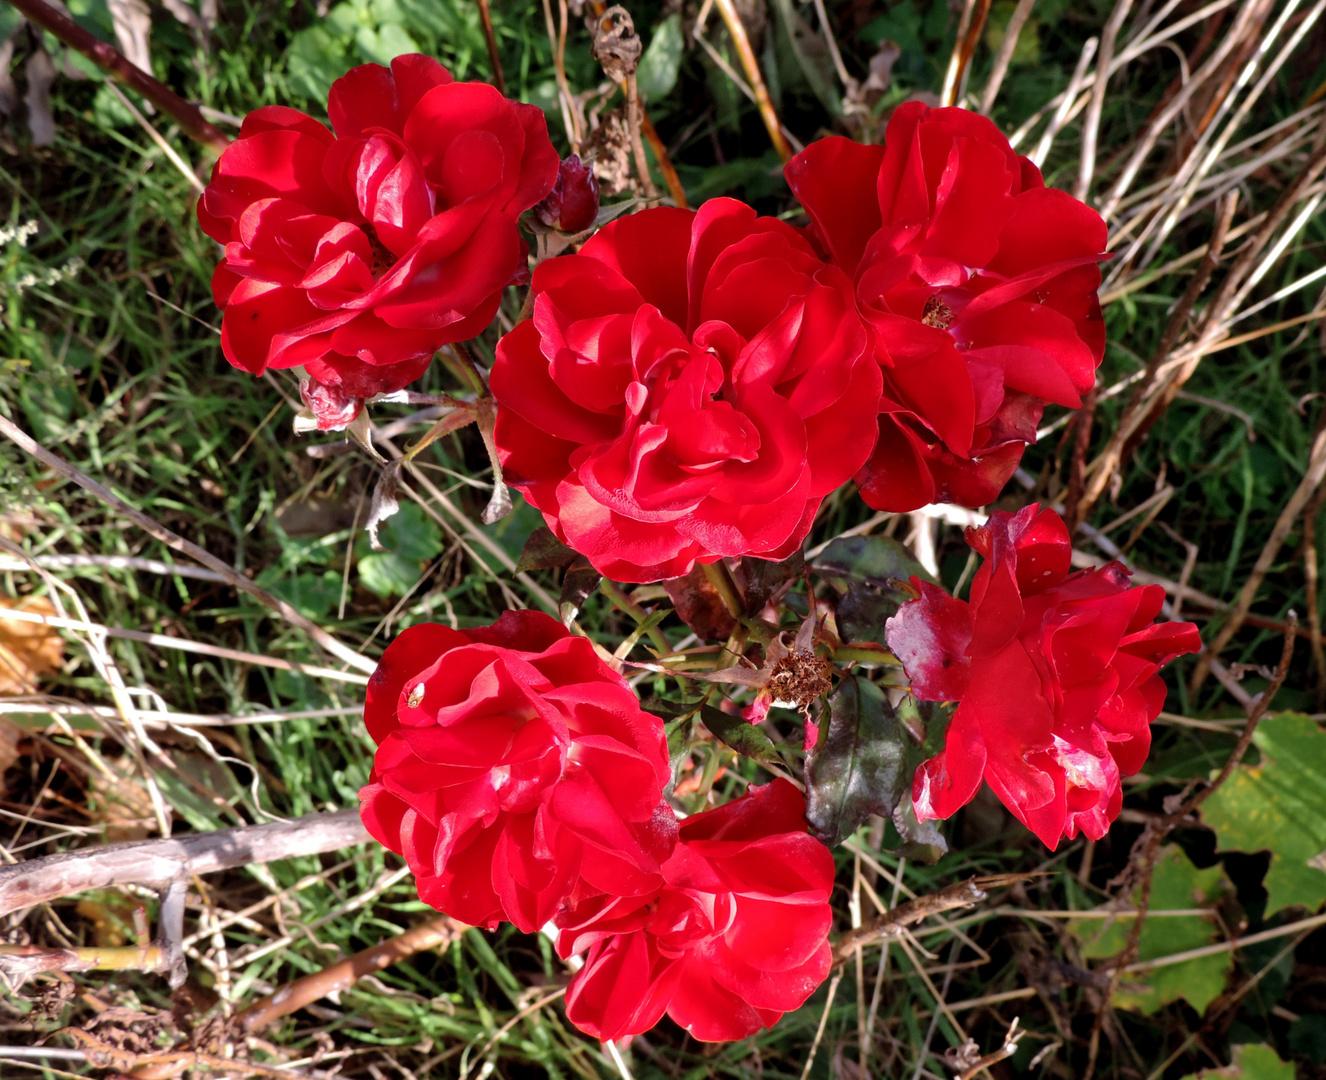 Blumen im gestrüpt